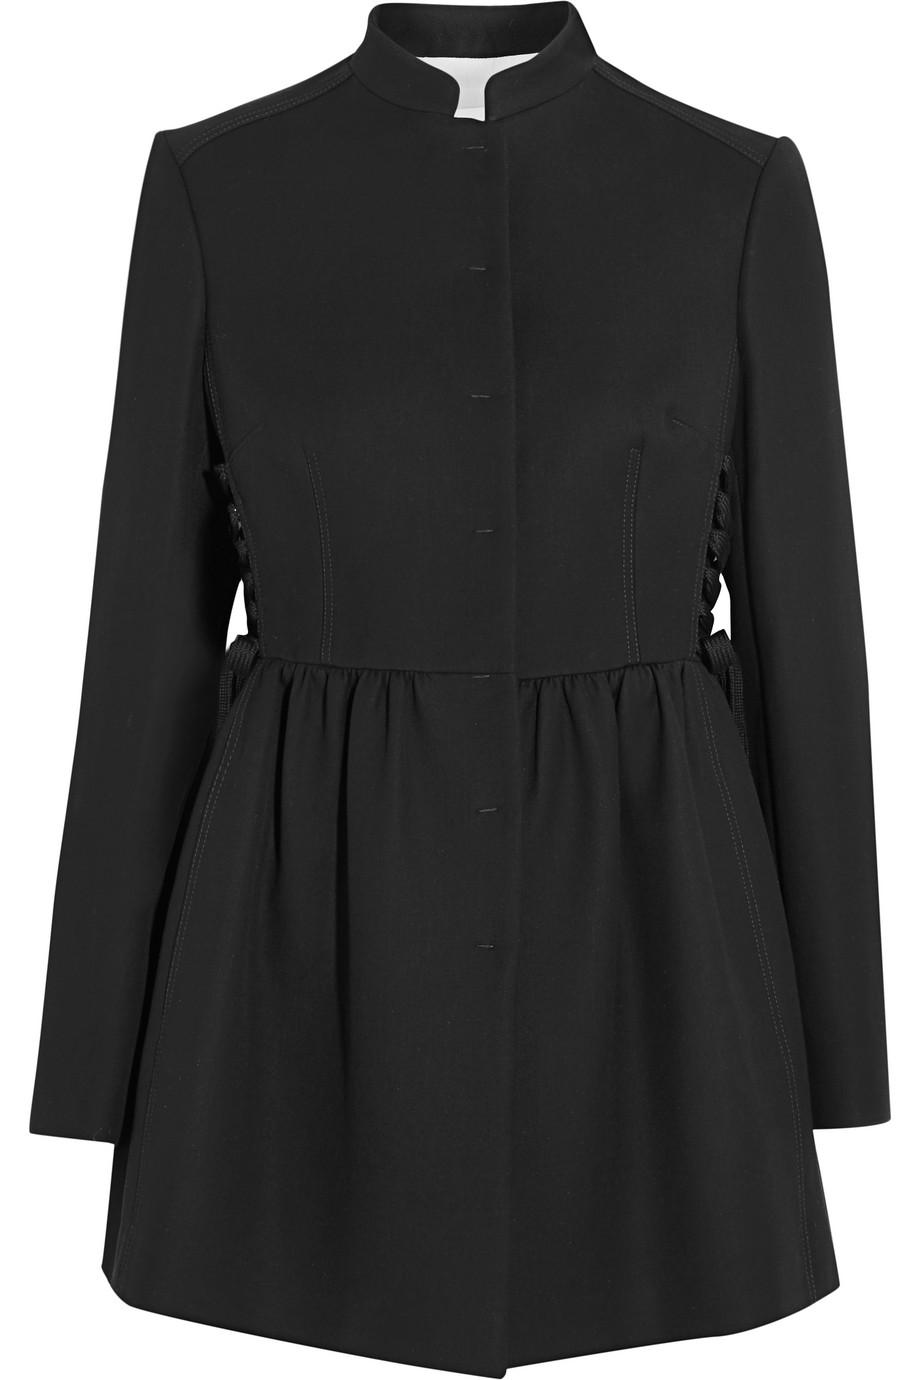 Redvalentino Lace-Up Cotton-Blend Cady Coat, Black, Women's, Size: 38